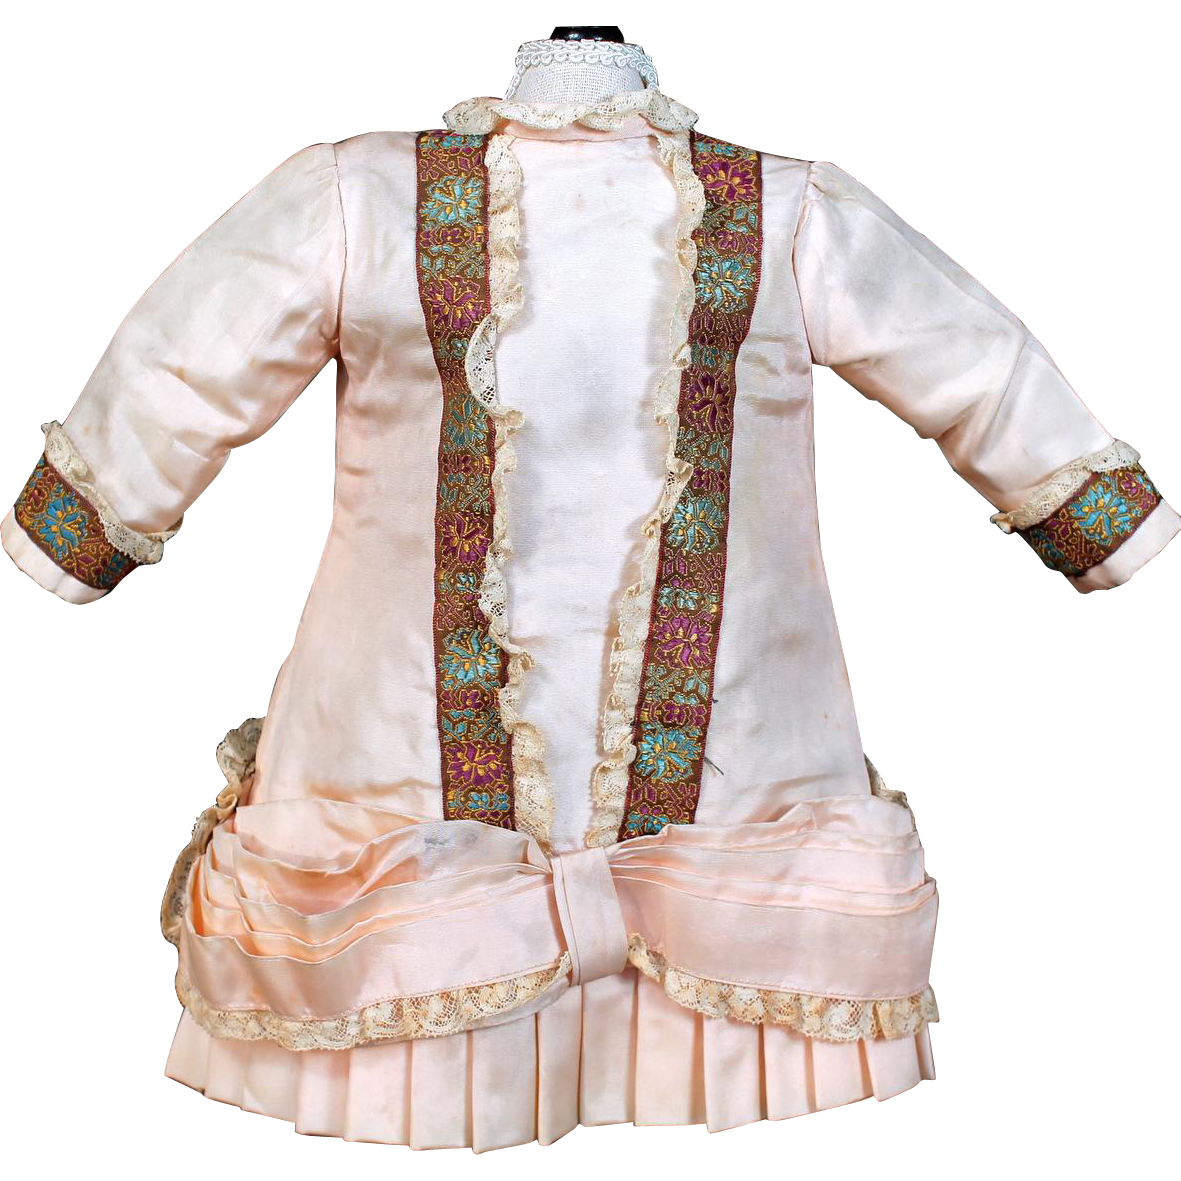 Peach Bebe Style Dress, A-line and Pleated Skirt